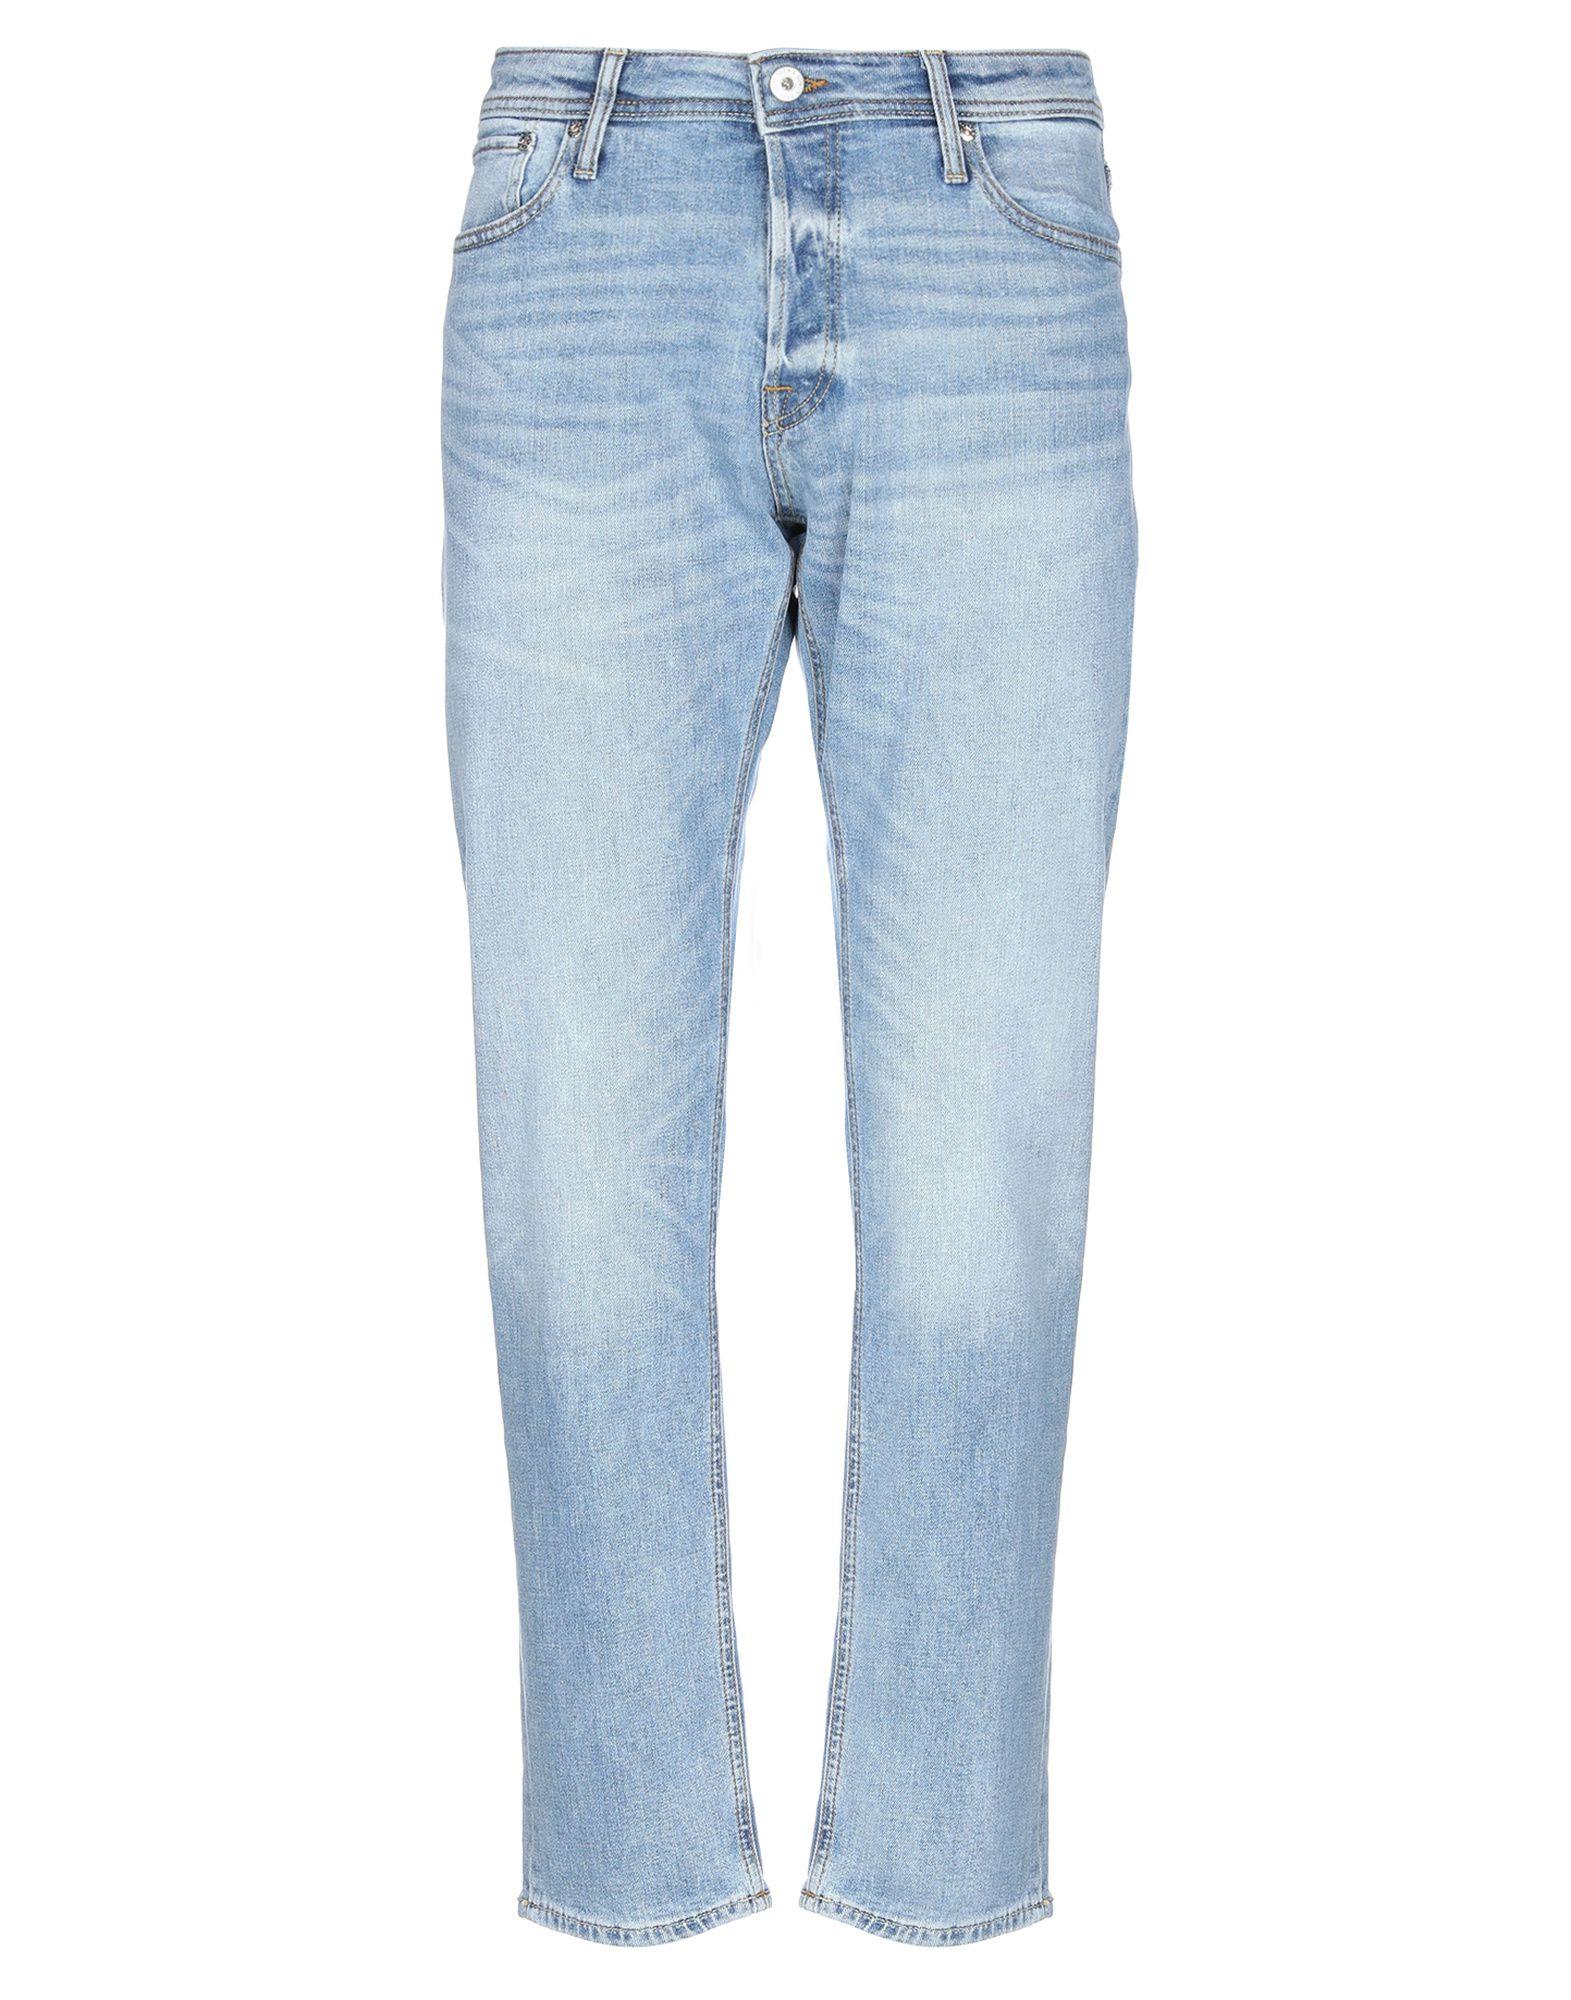 Pantaloni Jeans Jack & Jones uomo - 42732415RQ